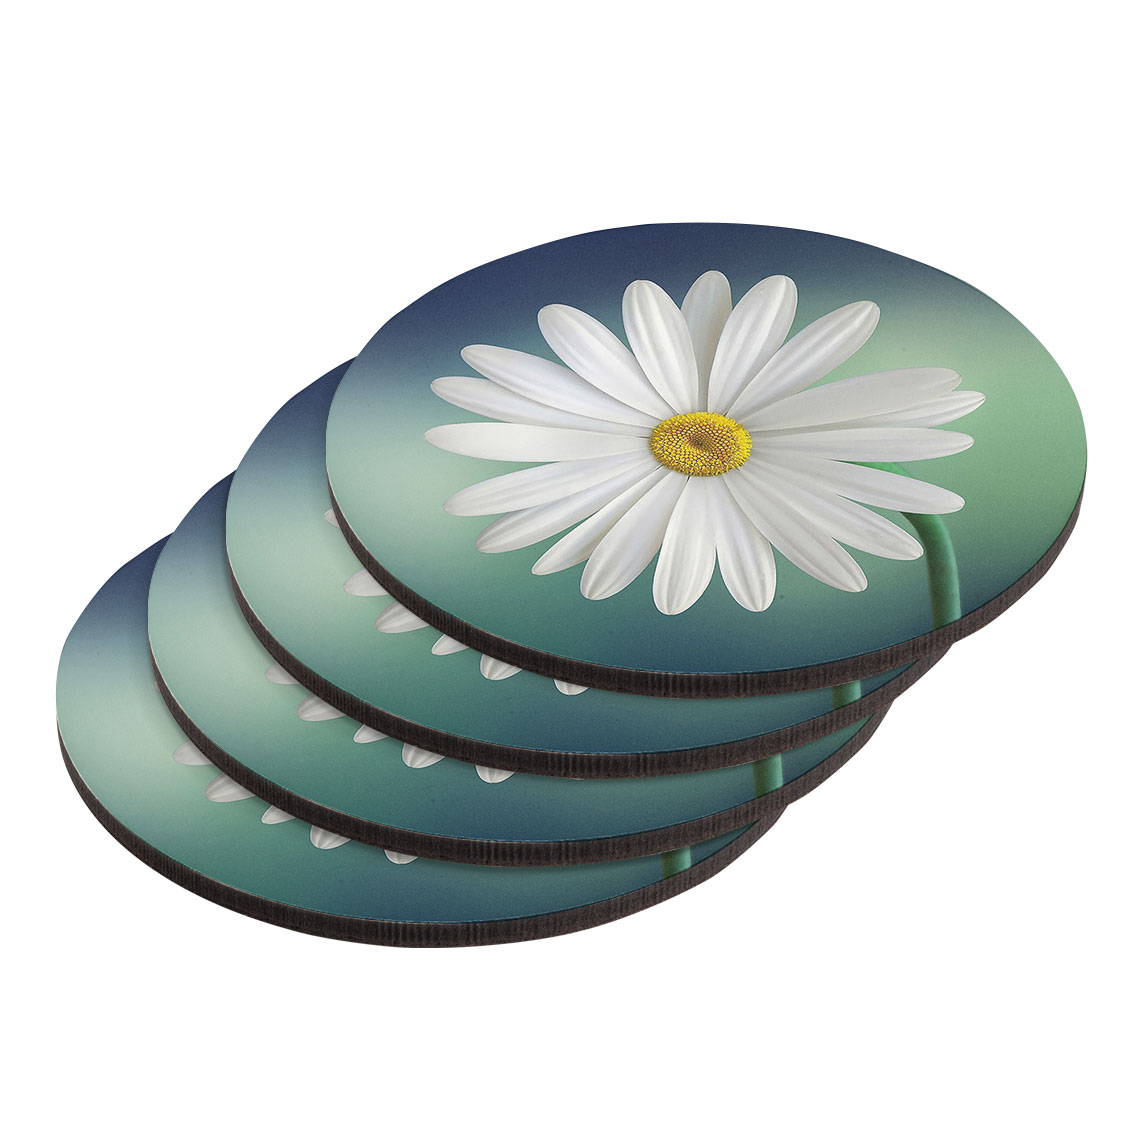 Round Coasters - Set of 4 (same image)